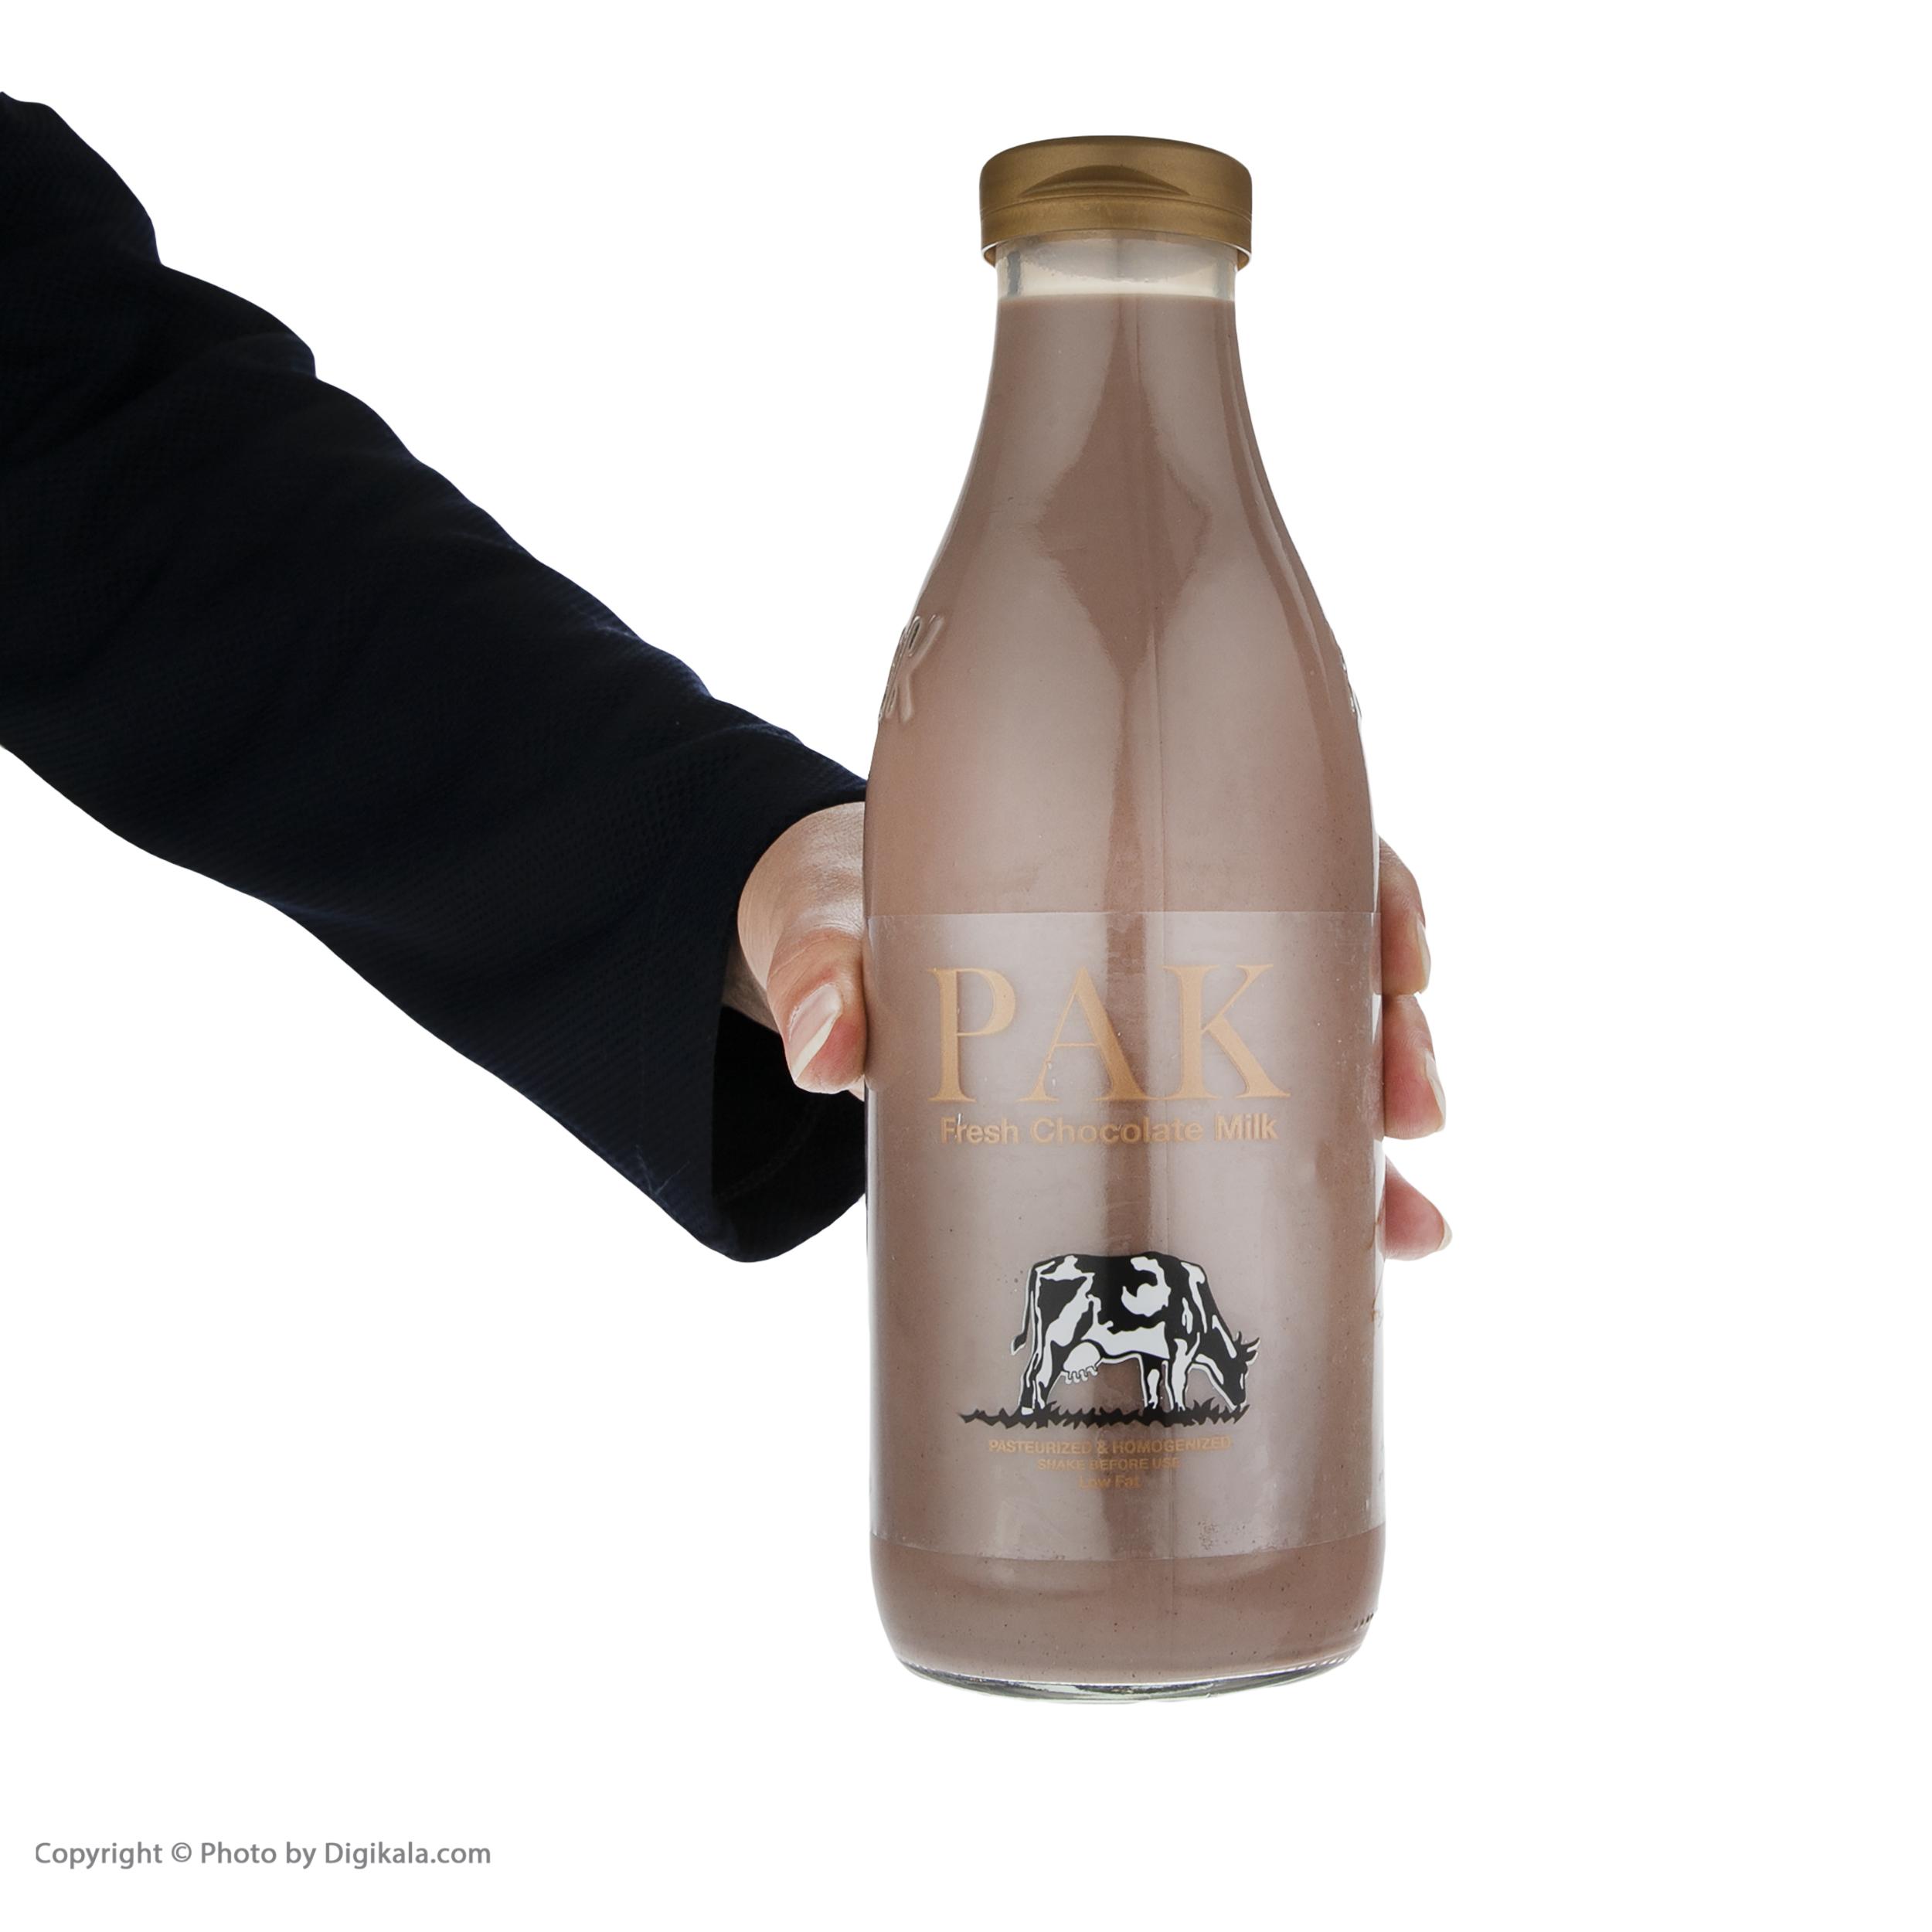 شیر کاکائو پاک - 1 لیتر